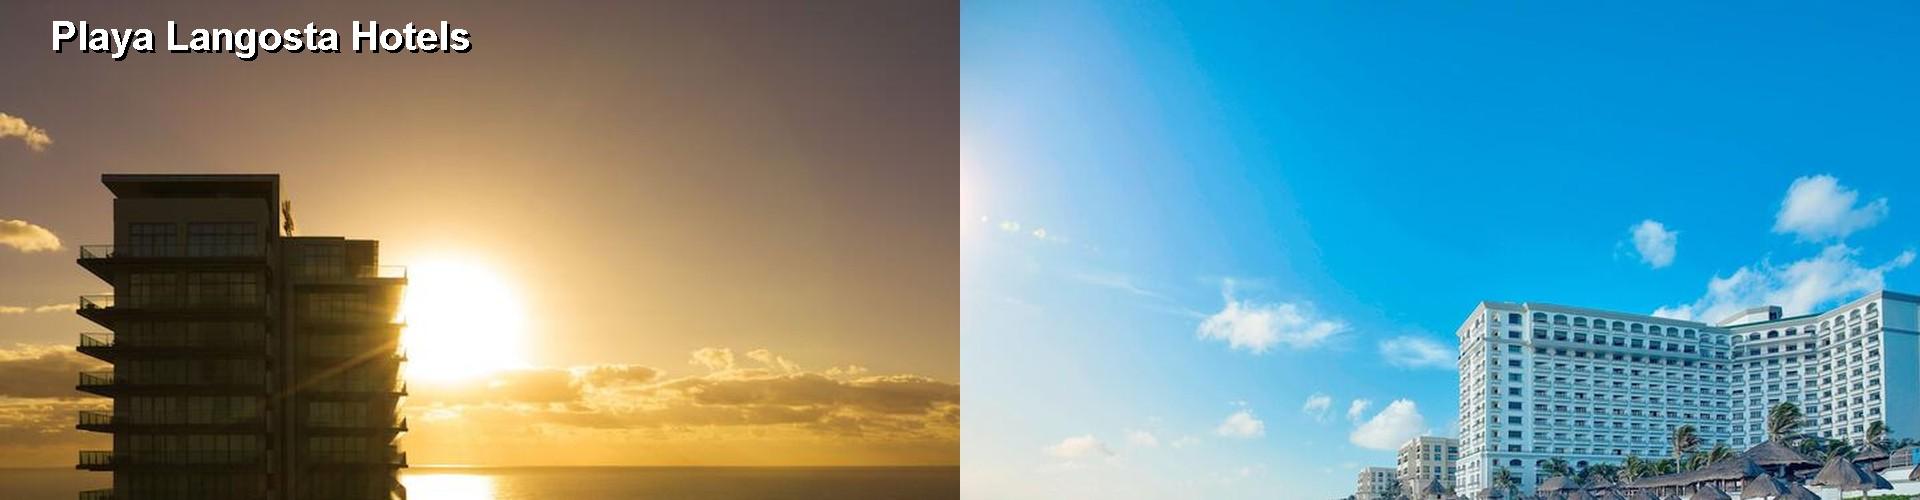 5 Best Hotels Near Playa Langosta